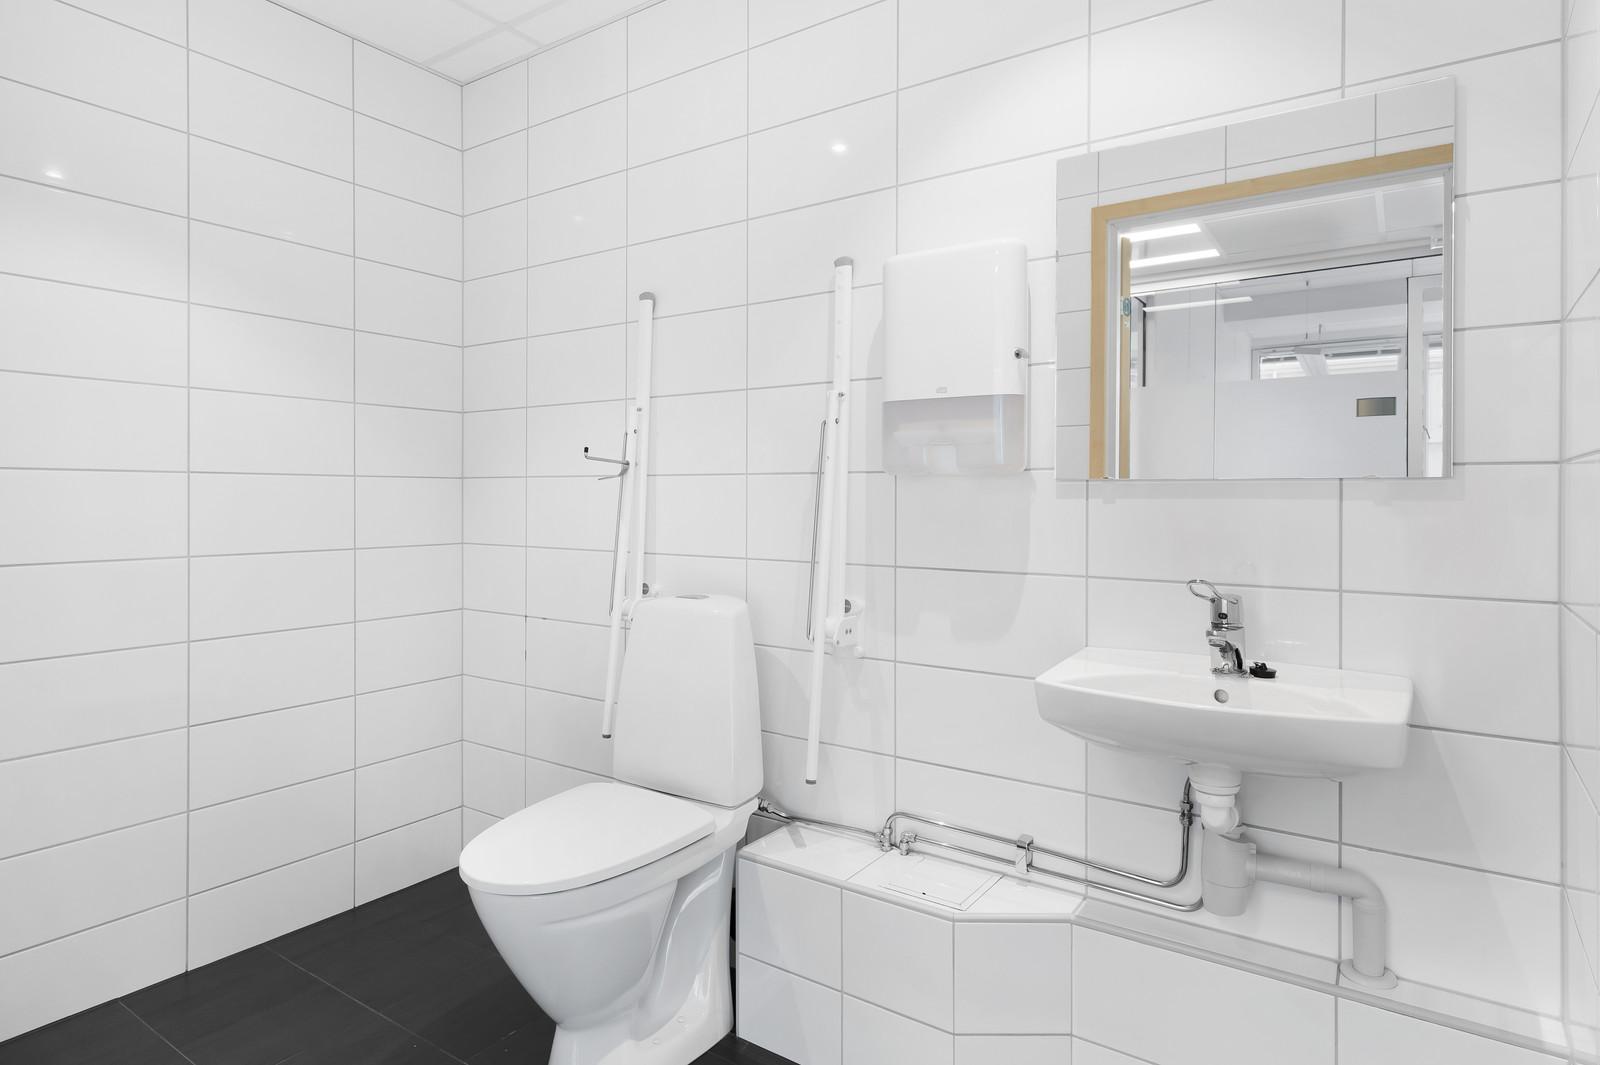 Universelt utformet WC